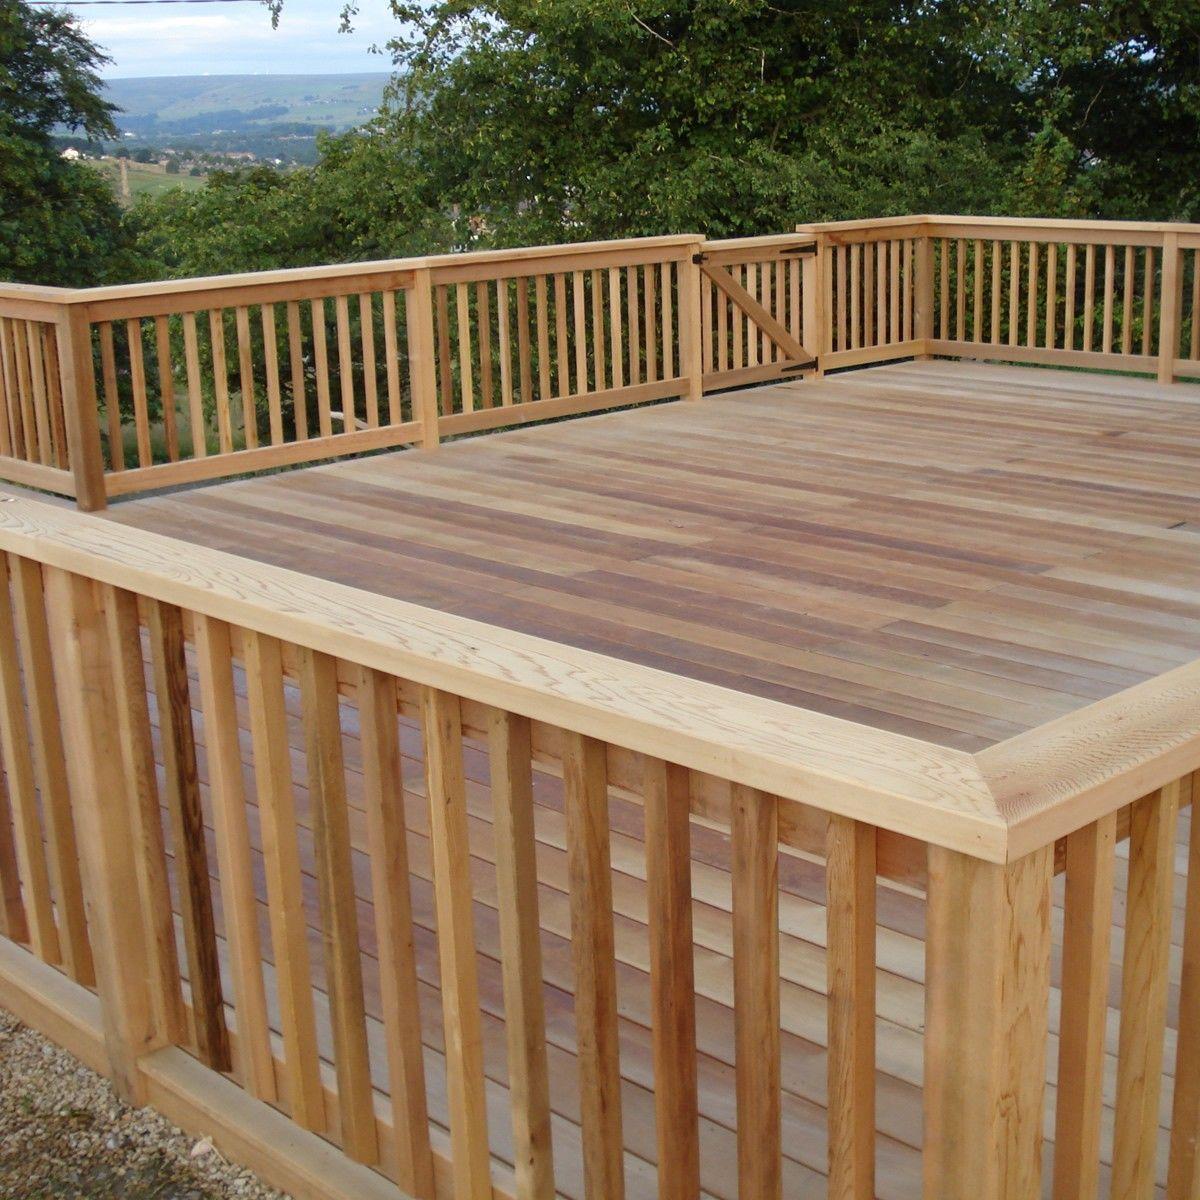 Wood deck railing ideas u2013 When it